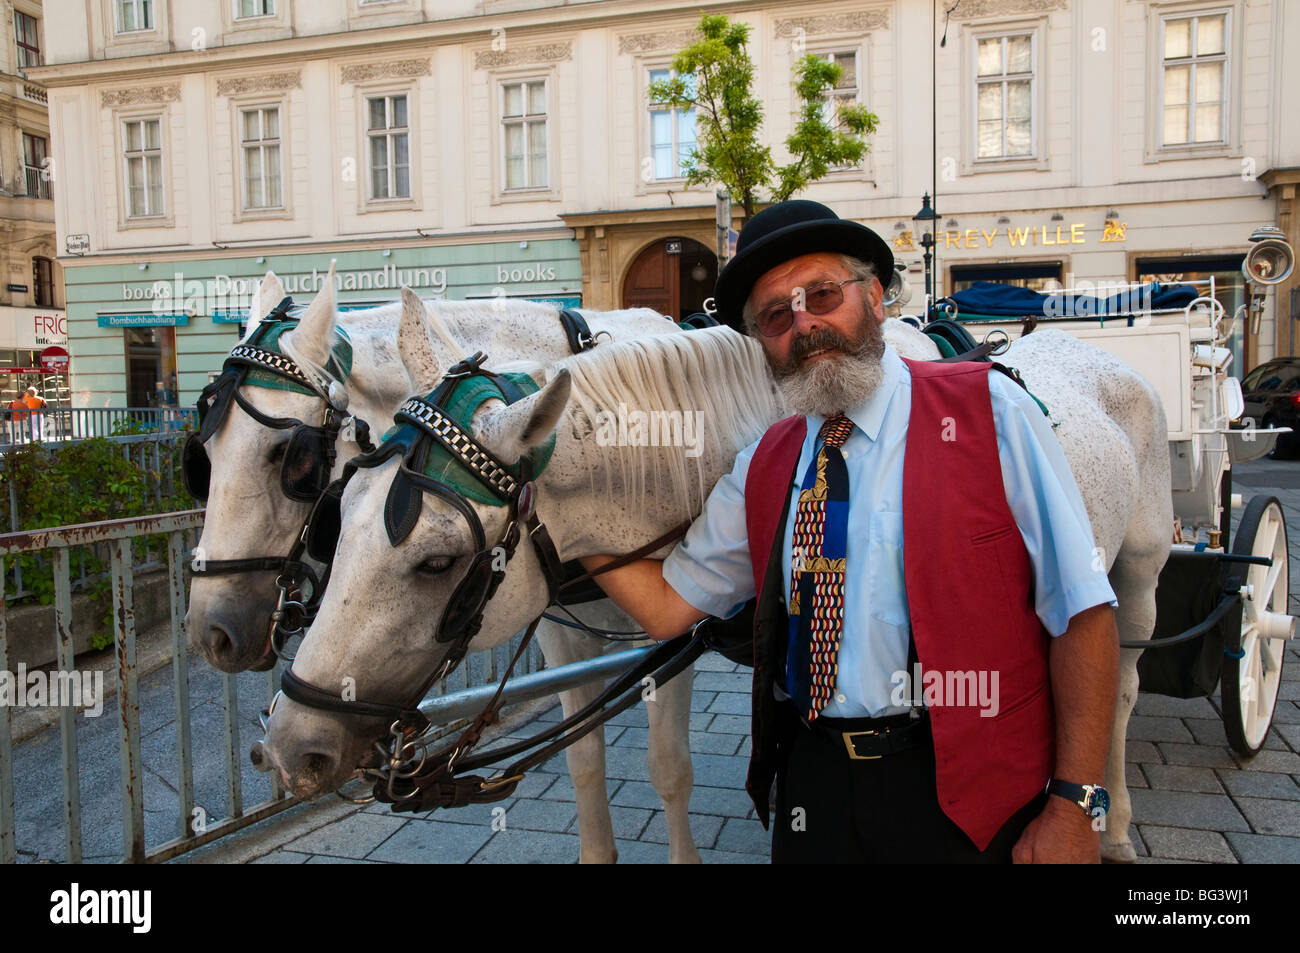 Fiaker, Kutscher, Wien, Österreich | Fiaker (horse carriage), coachman, Vienna, Austria  Stock Photo